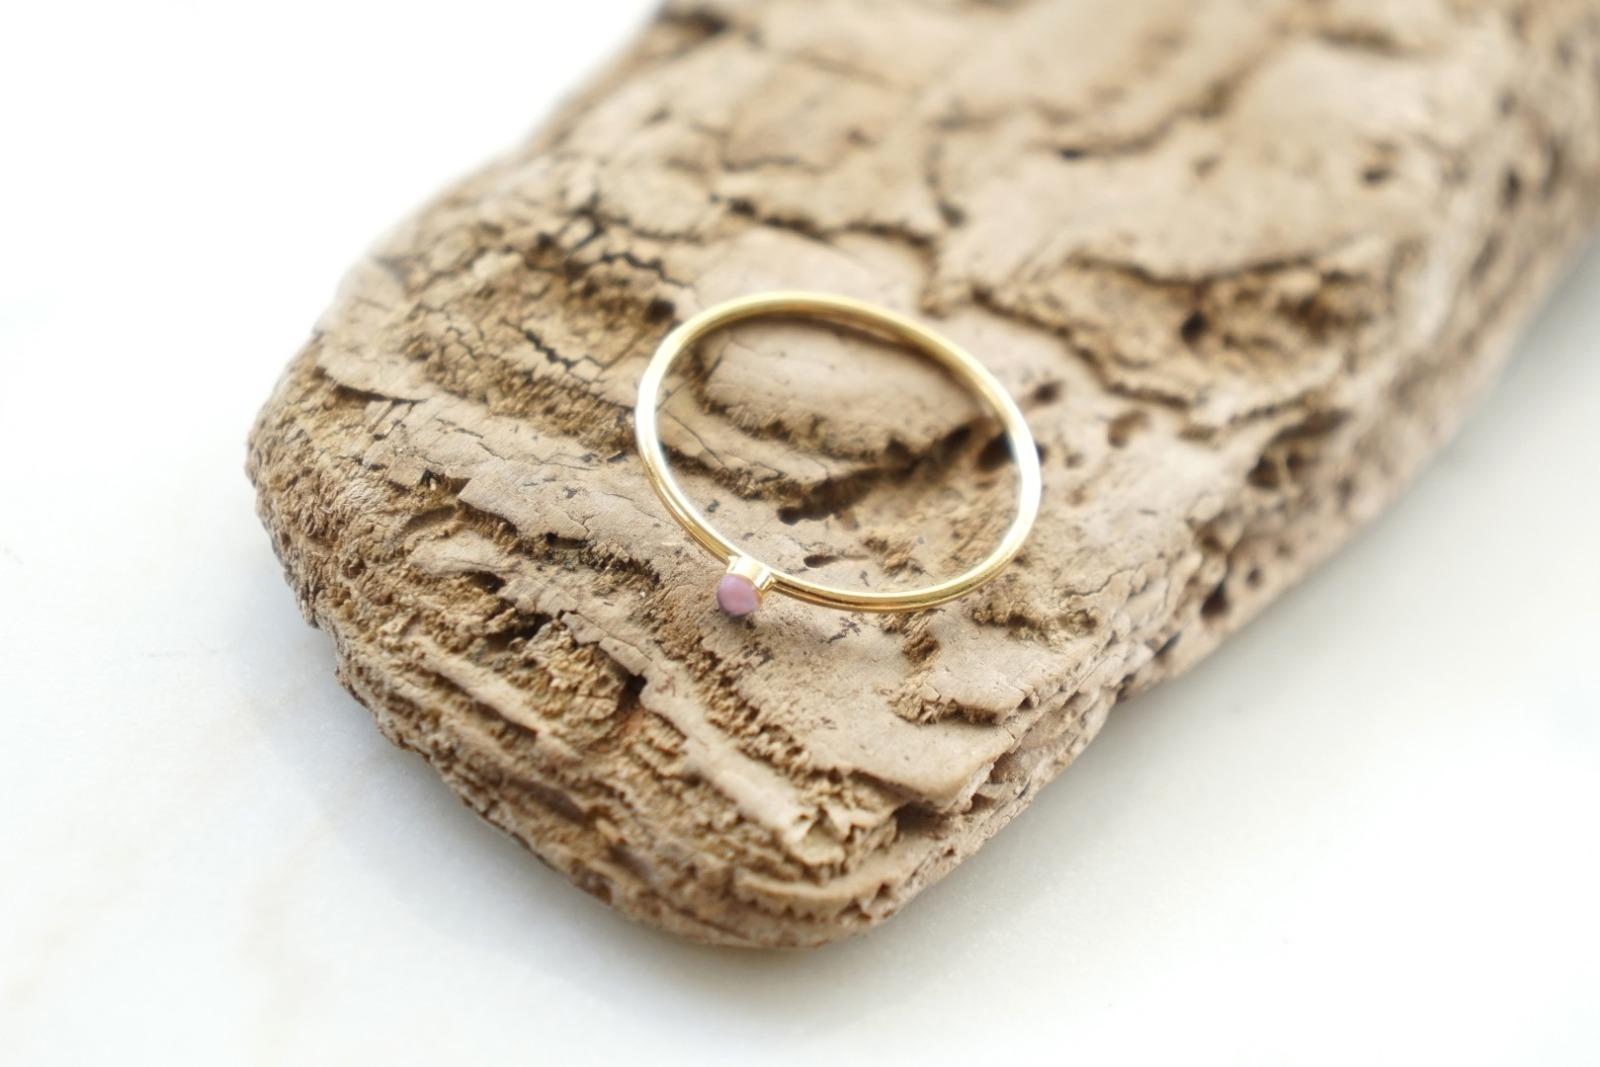 Zierlicher Ring Stapelring vergoldet Rosa Opal Fassung - 1